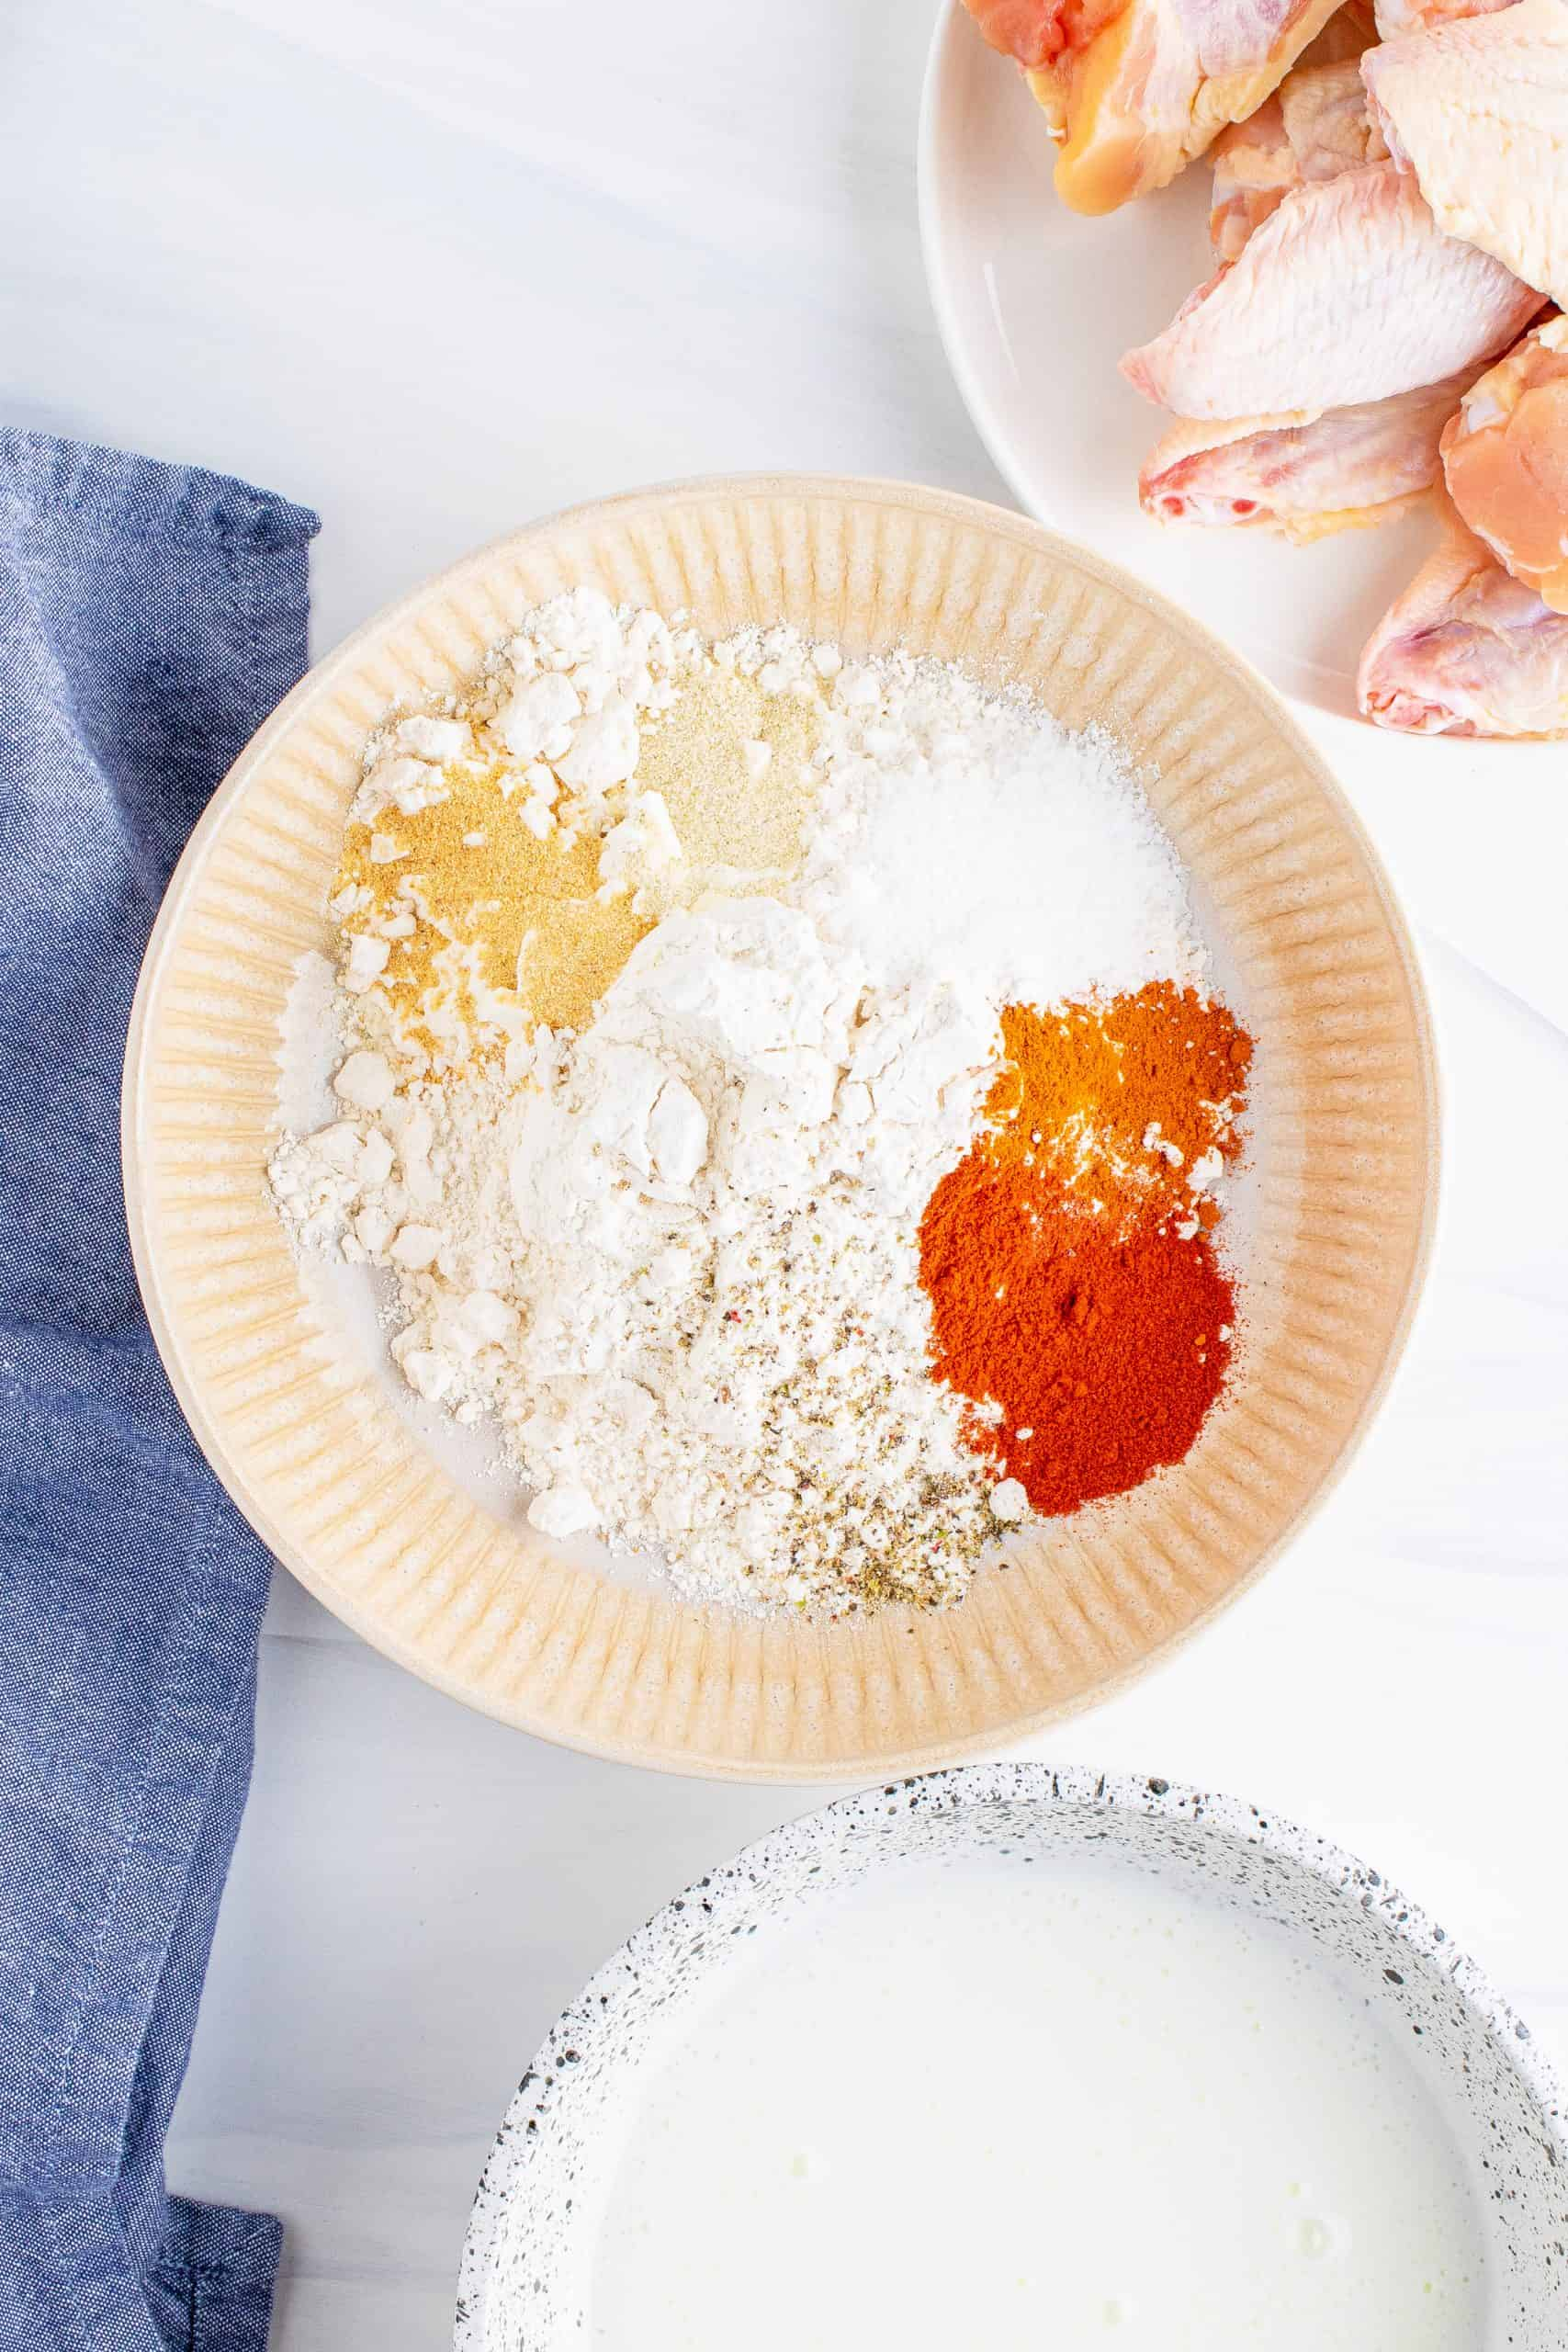 flour, paprika, cayenne pepper, salt, garlic and onion powders.